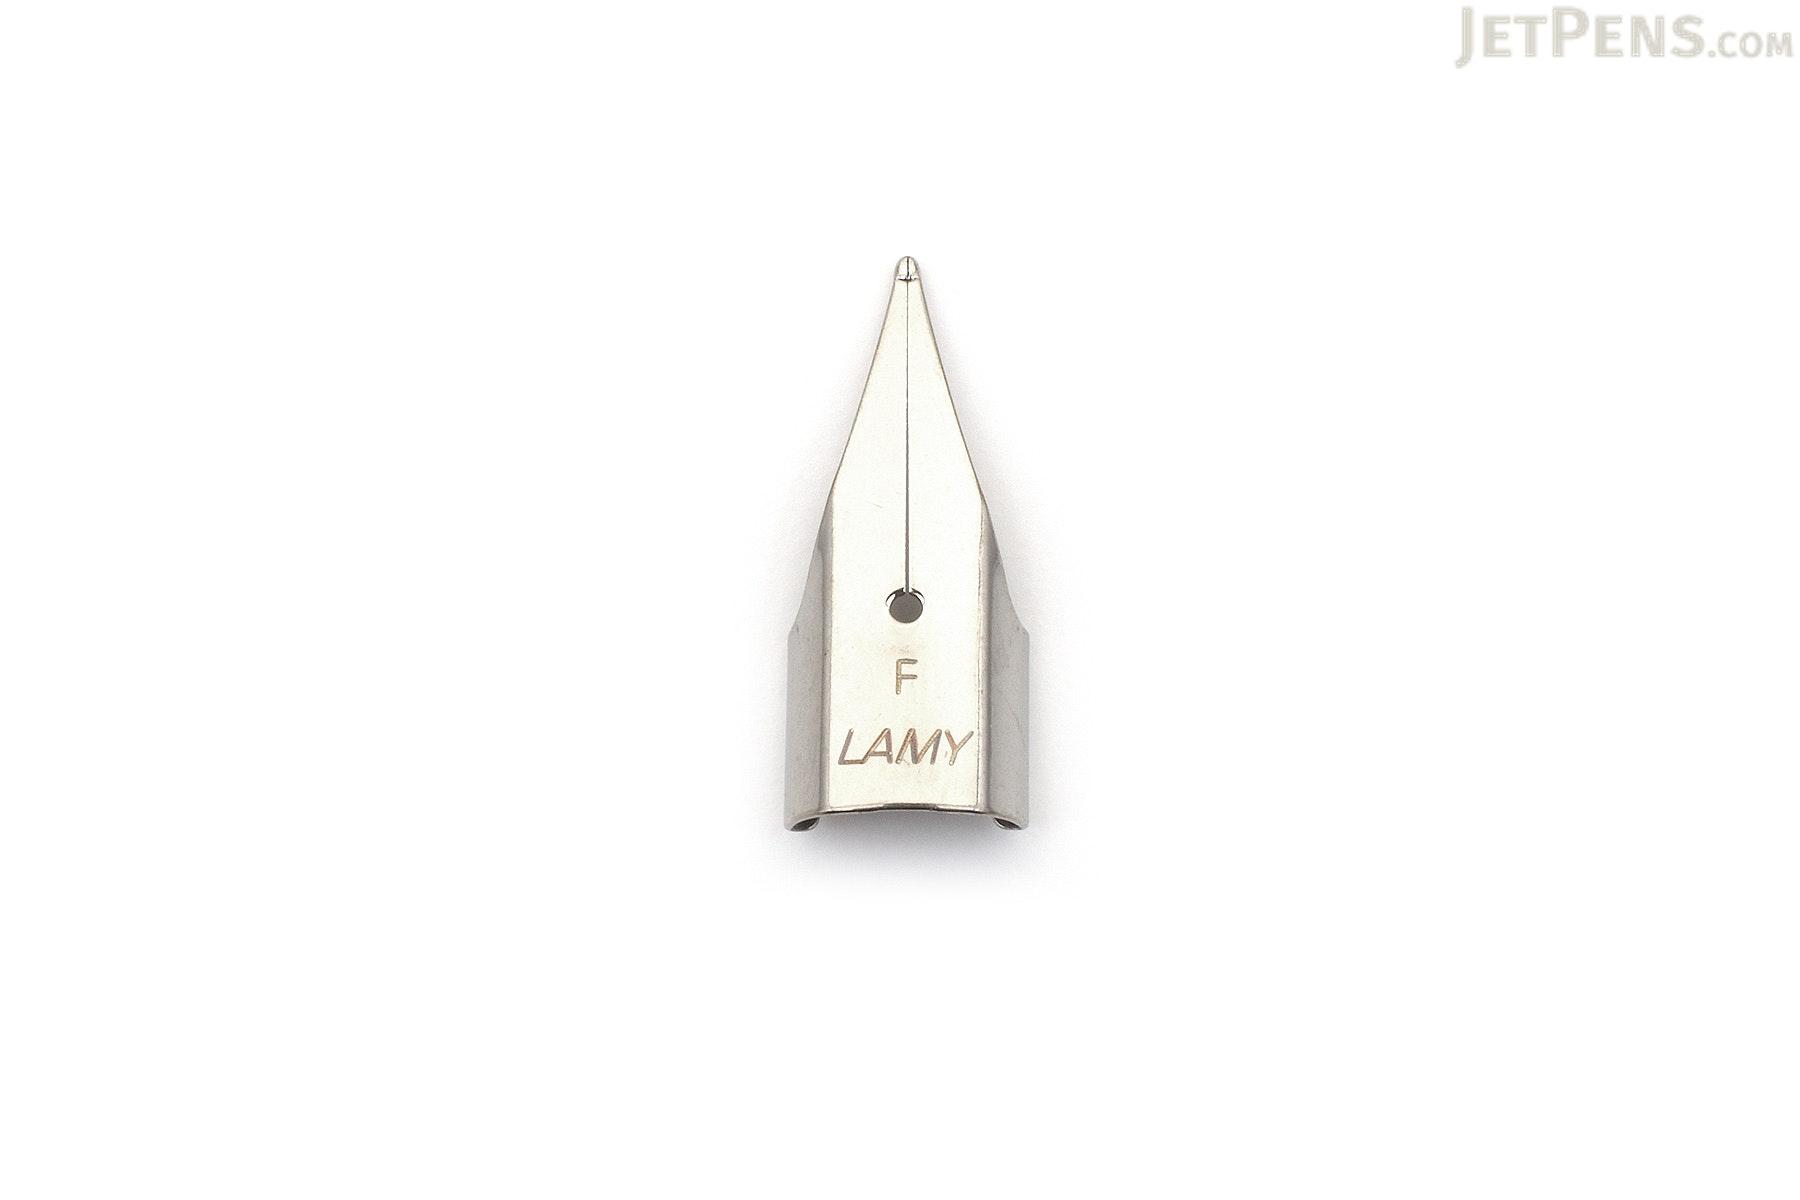 Lamy Fountain Pen Nib - Stainless Steel Finish - Fine - LAMY LZ50SL-F